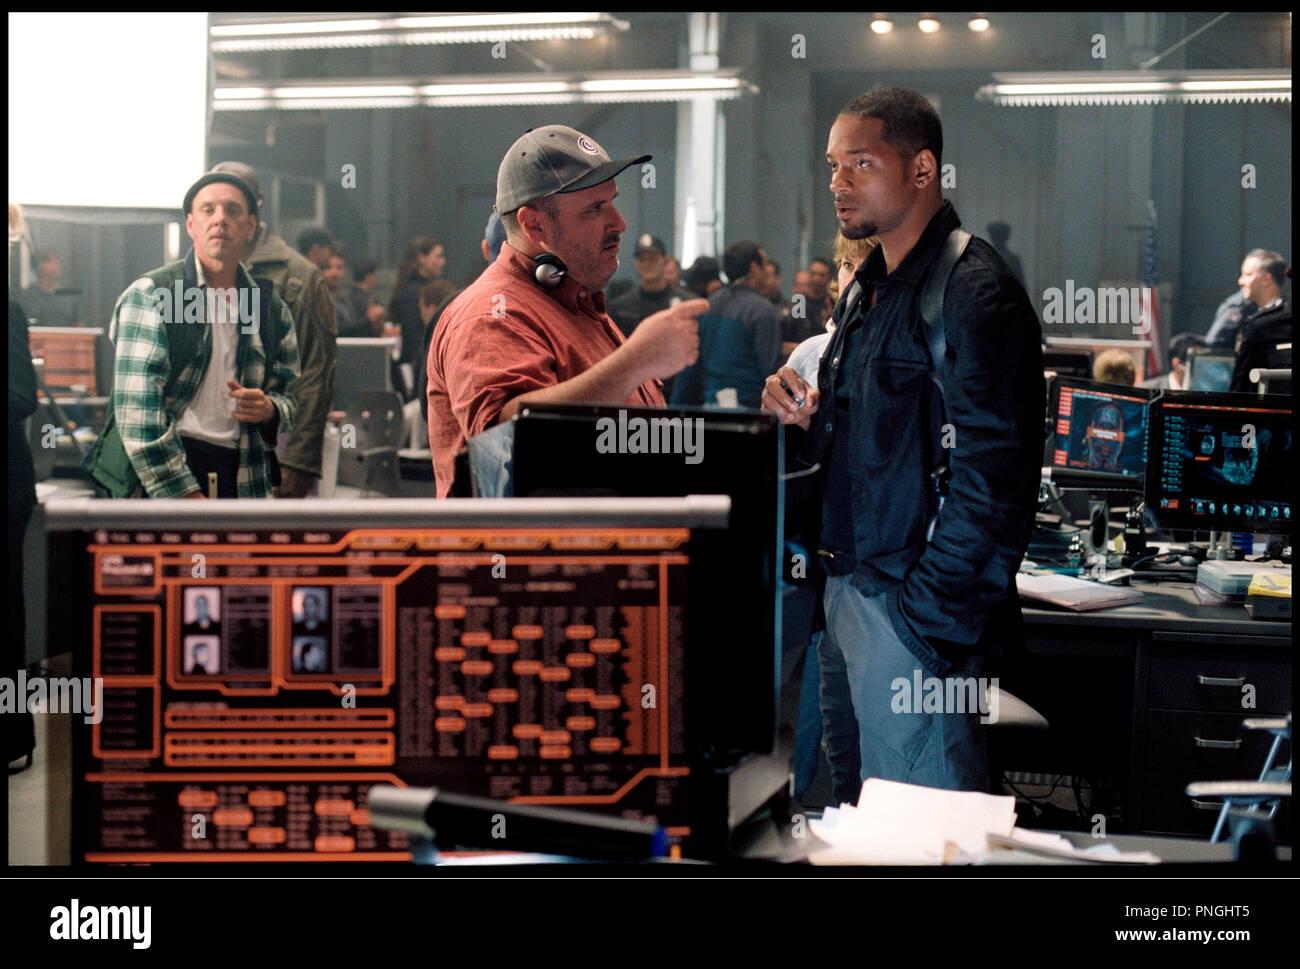 Prod DB © 20th Century Fox - Overbrook Entertainment / DR I, ROBOT (I ROBOT) de Alex Proyas 2004 USA avec Alex Proyas et Will Smith sur le tournage inspire du livre de Isaac Asimov - Stock Image